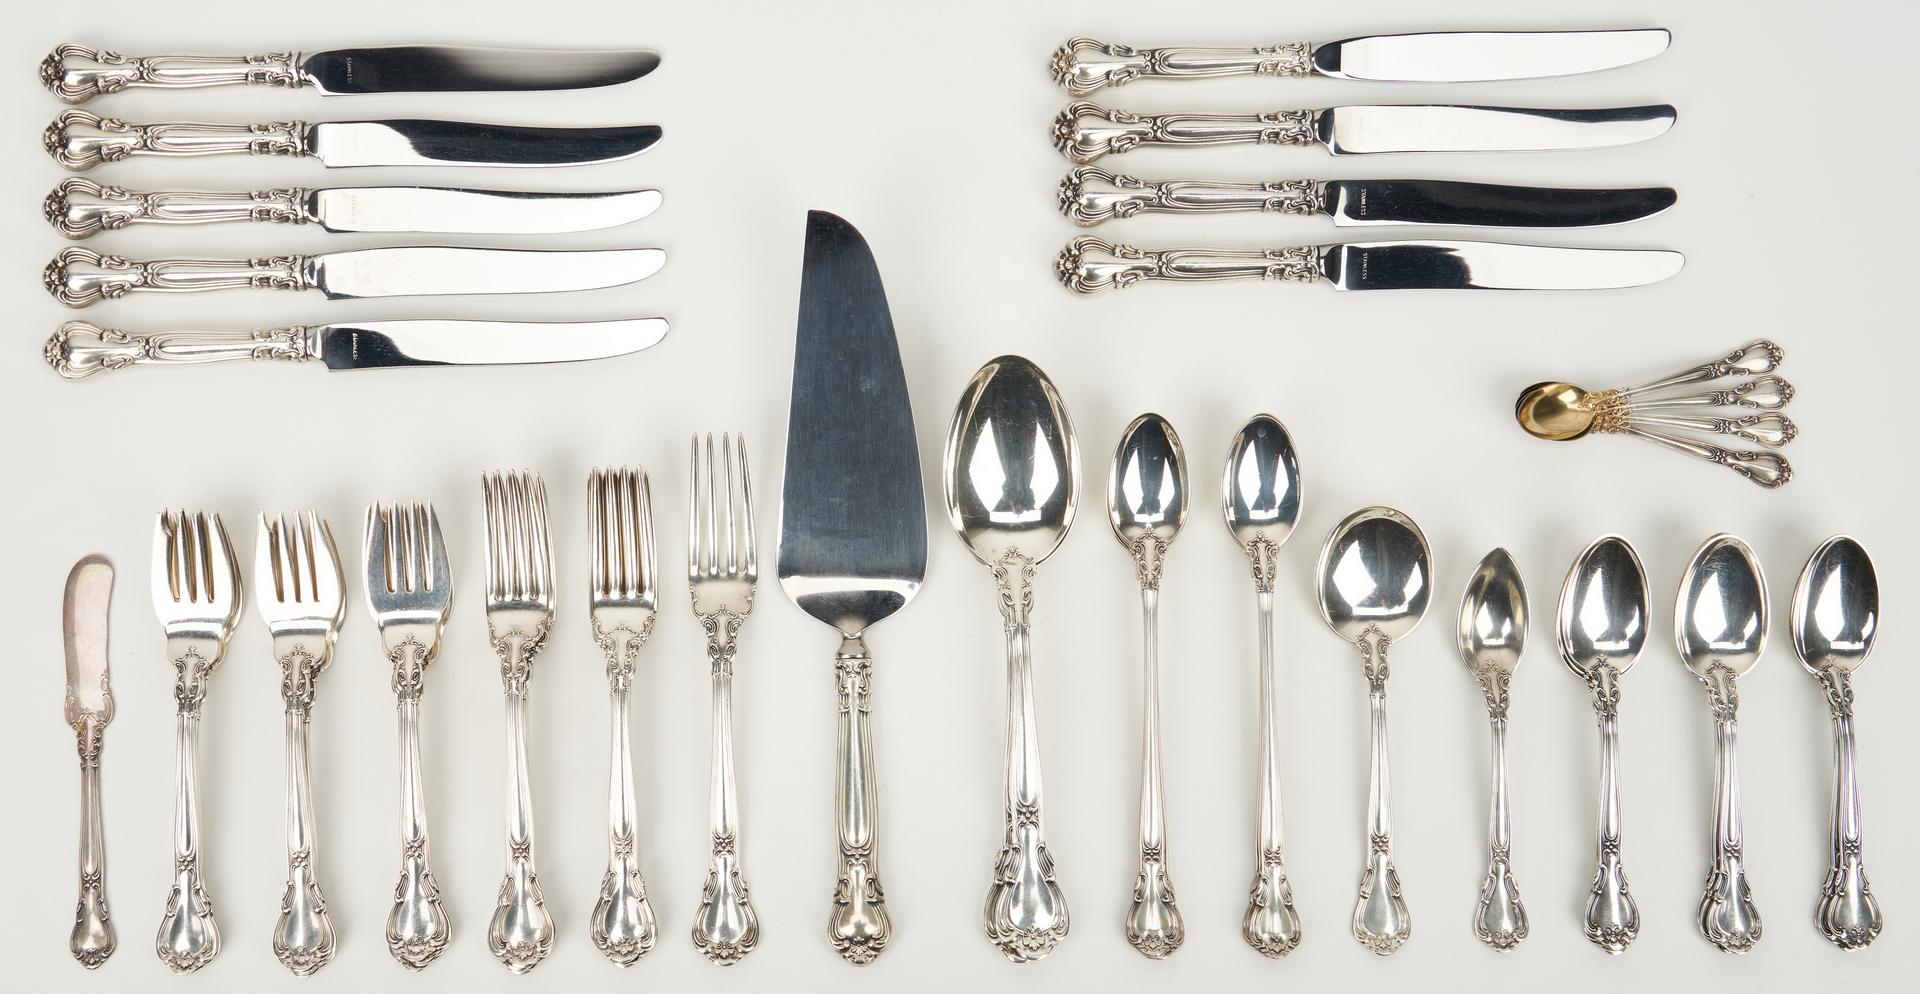 Lot 449: 56 Pcs. Gorham Chantilly Sterling Silver Flatware